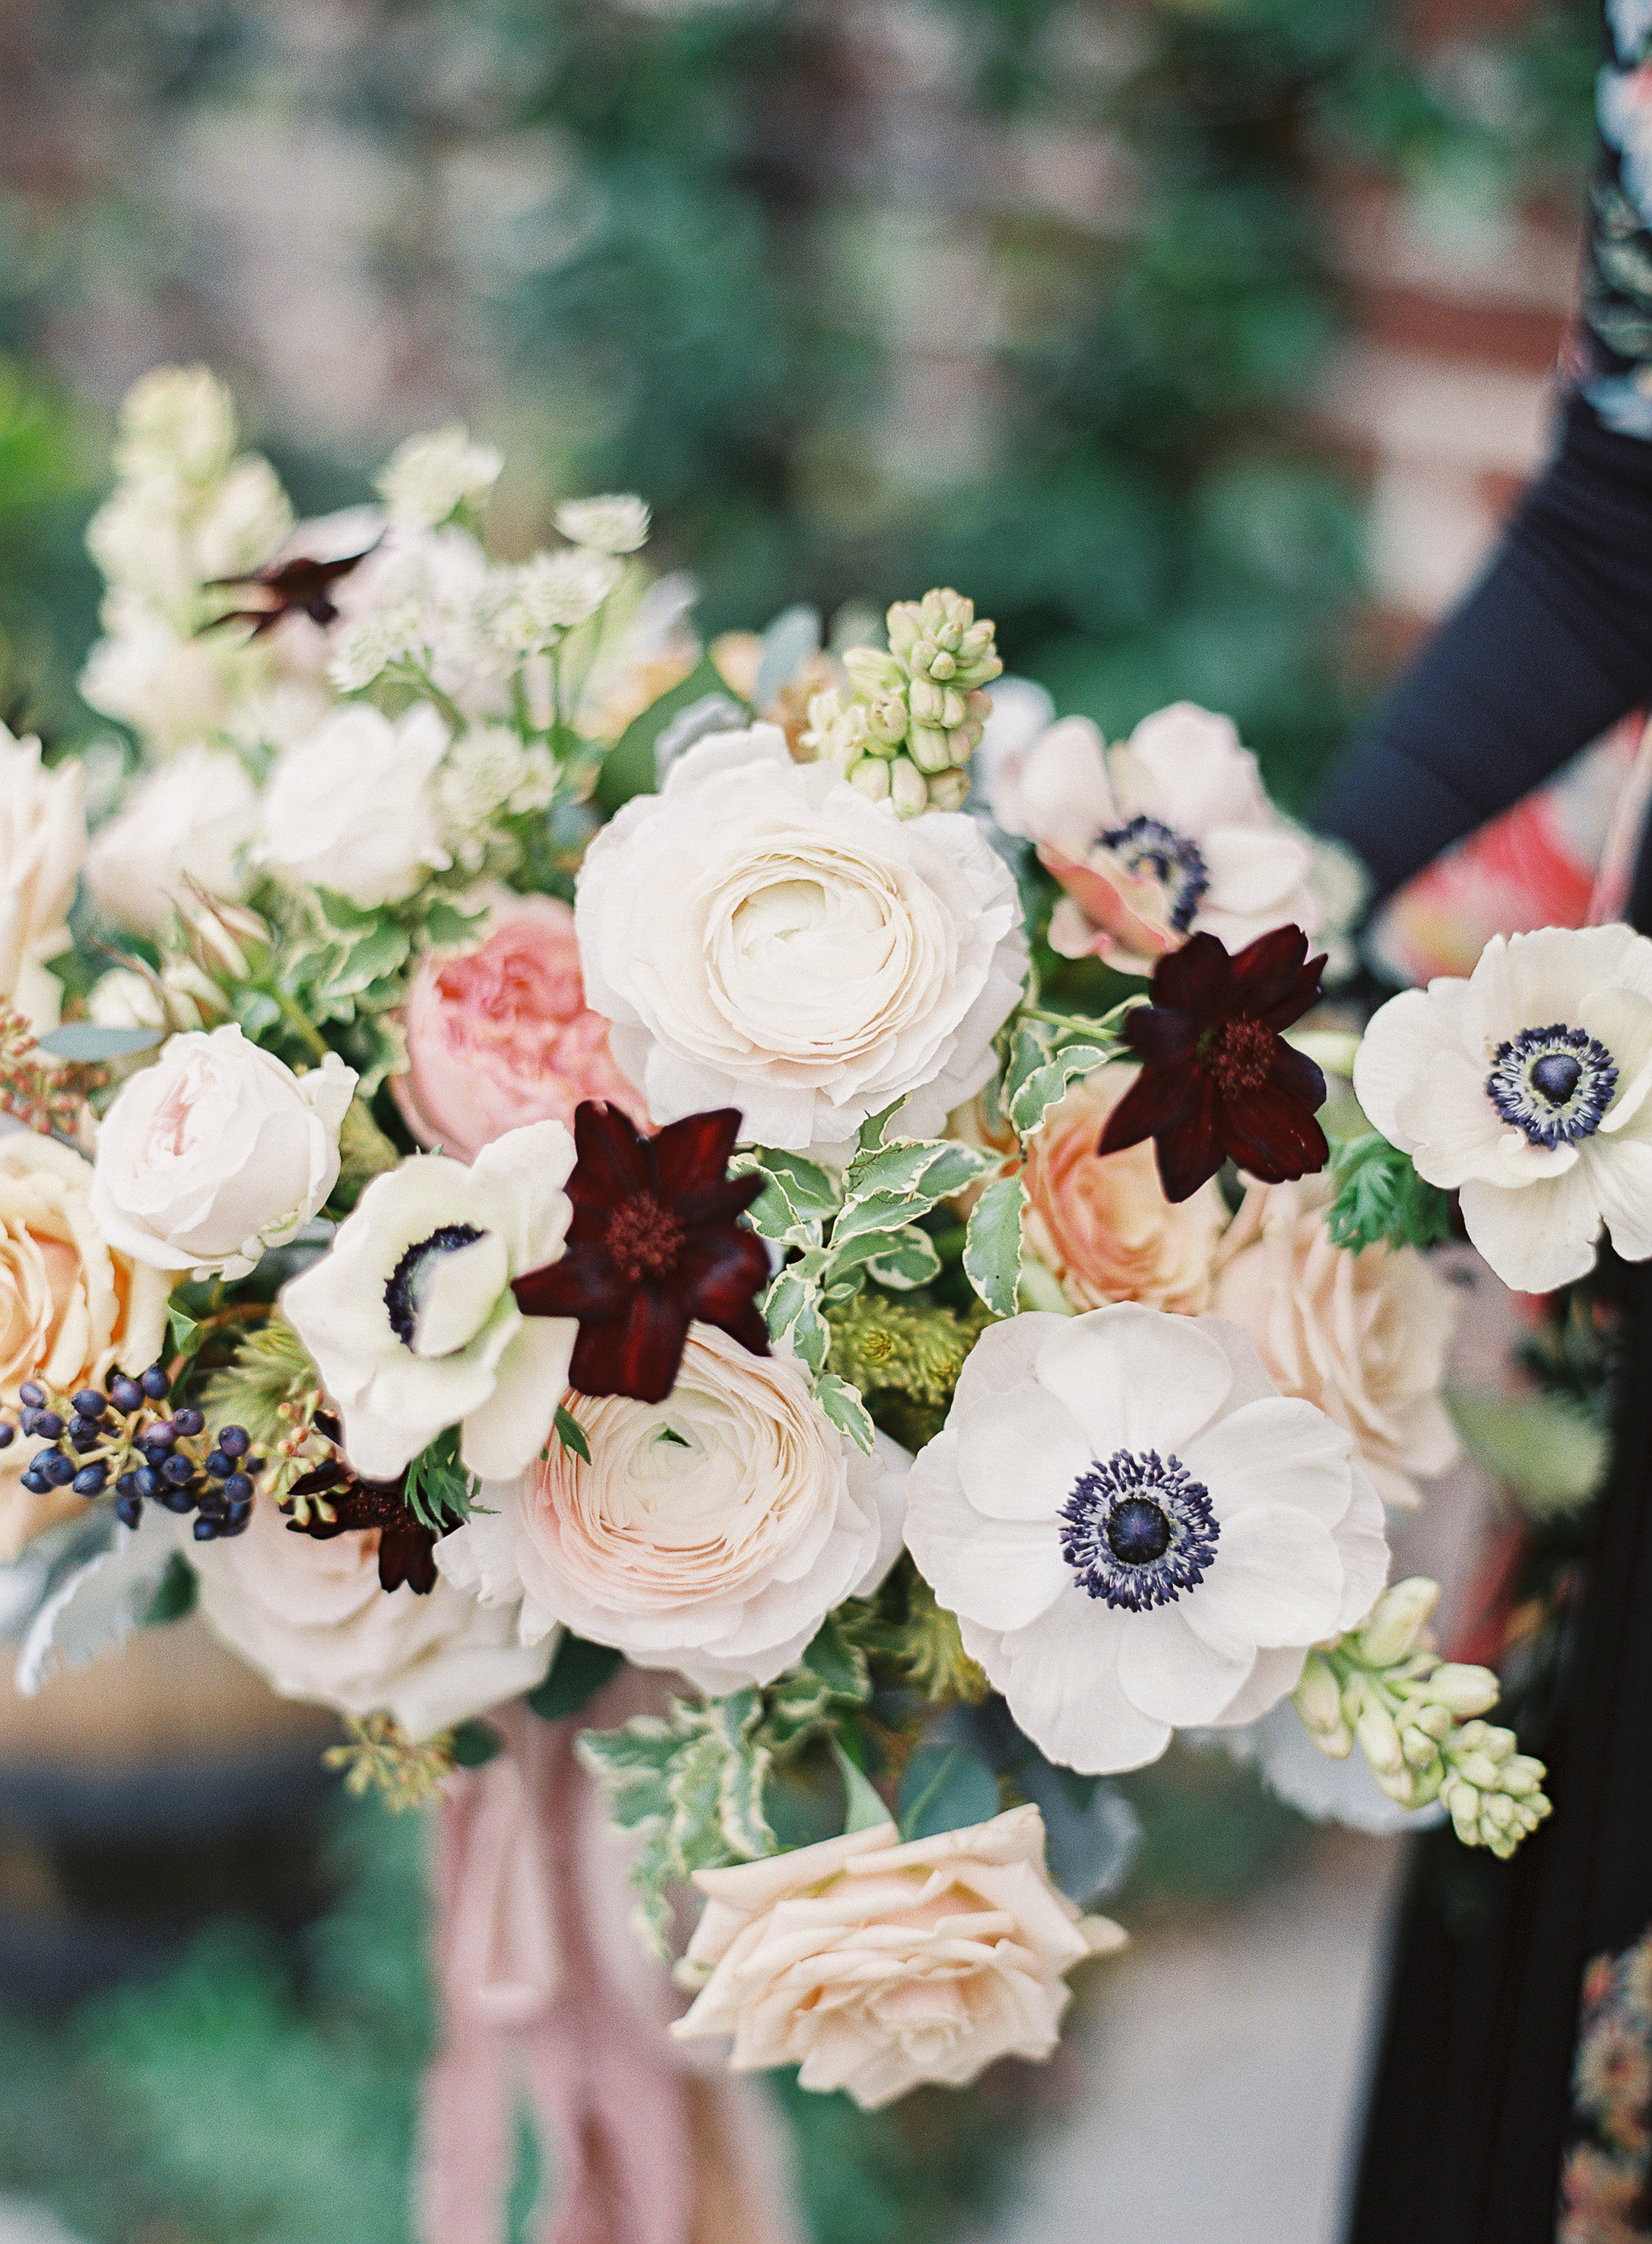 Tono and Co Lavenders Flowers-Lavenders Flowers-0008.jpg